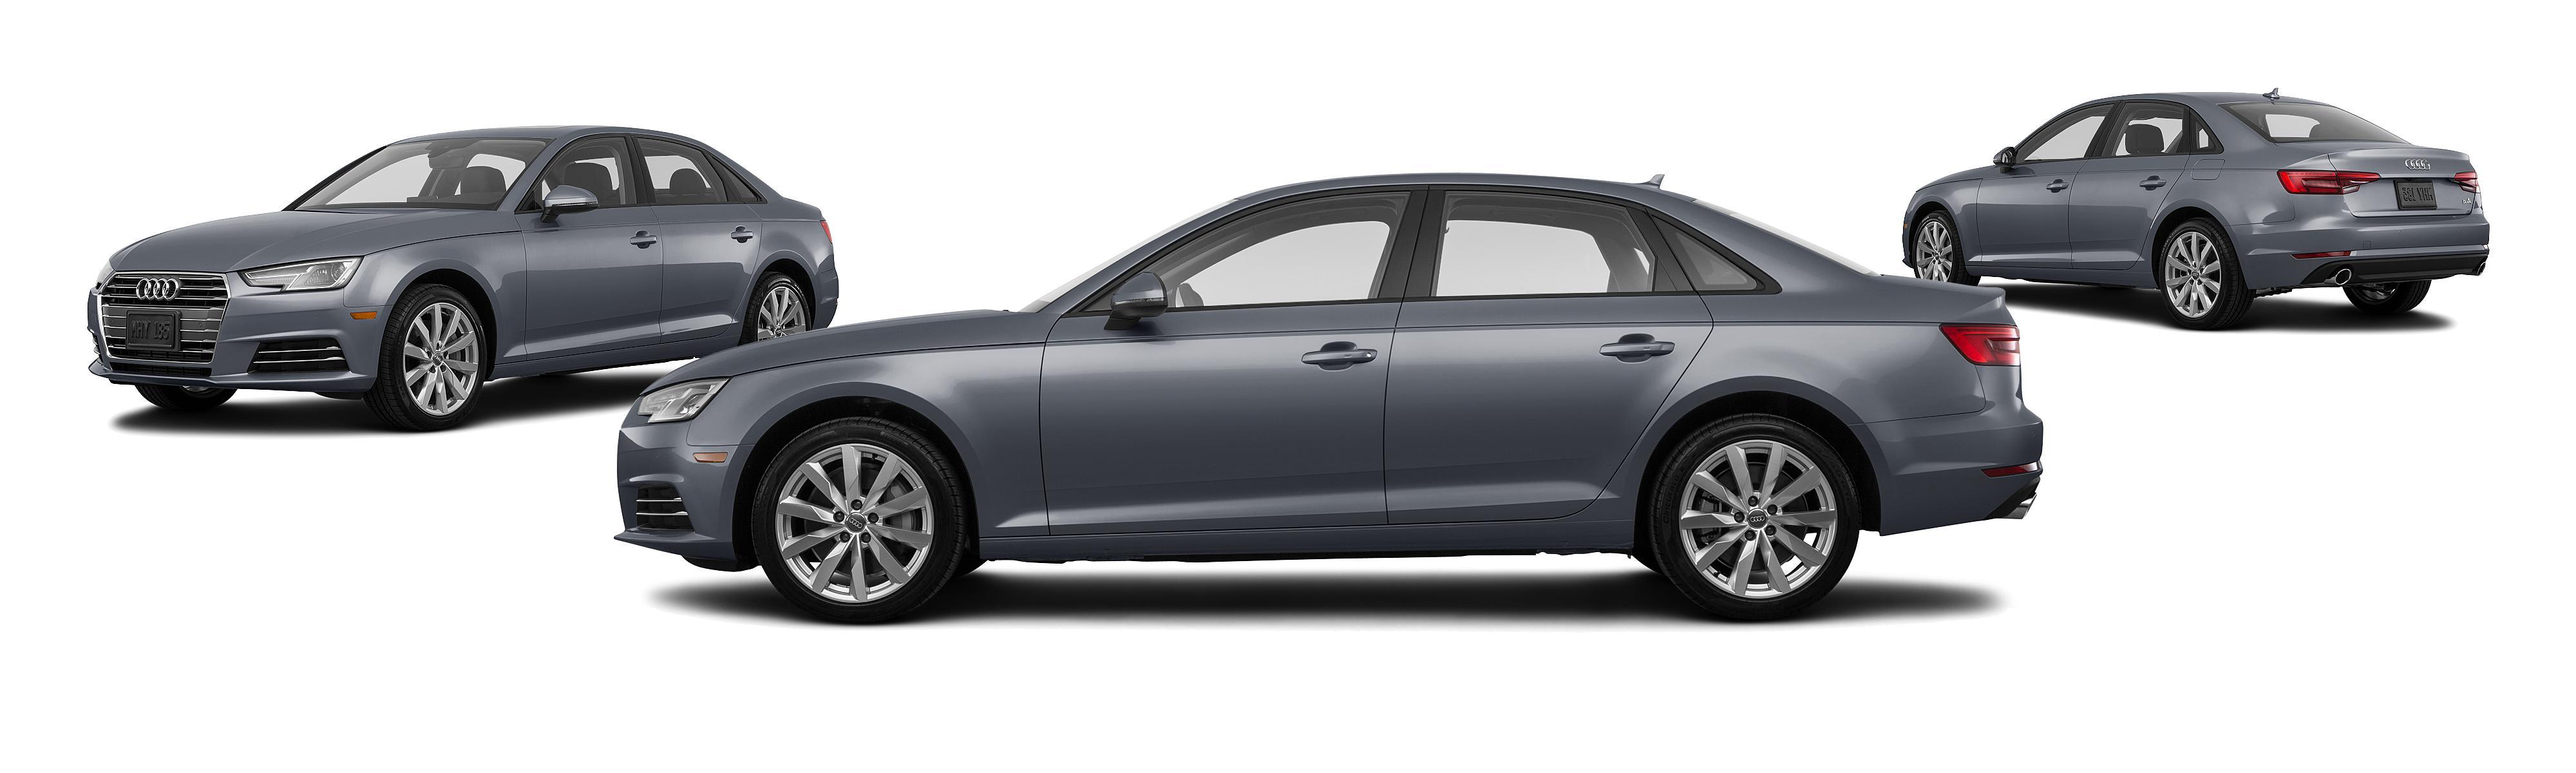 2017 Audi A4 AWD 2 0T quattro Prestige 4dr Sedan 6M Research